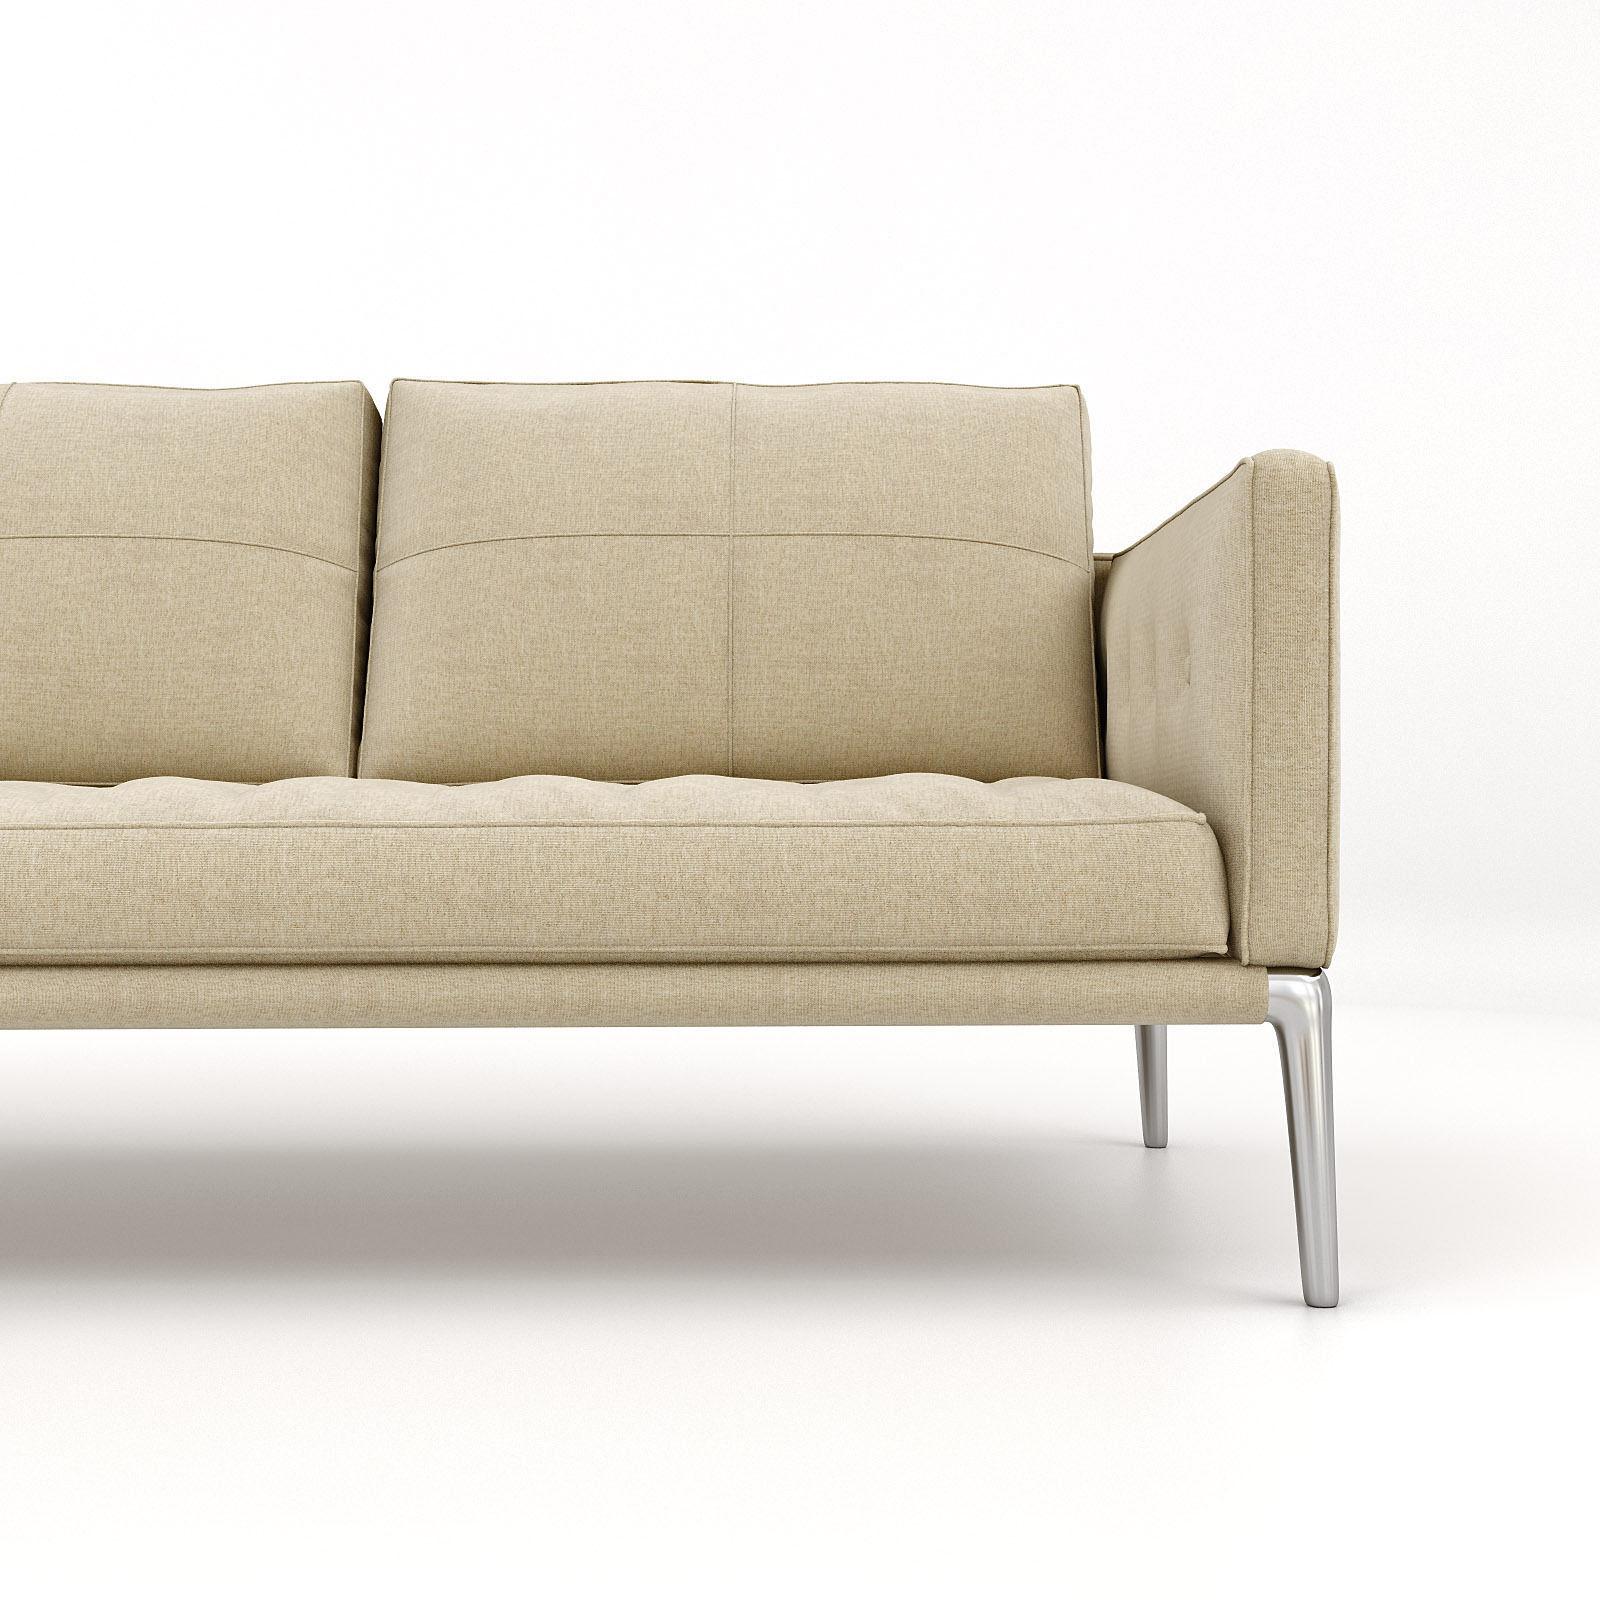 Modern living room interior 3ds max scene with all furniture 3d models - Cassina 243 Volage 3d Model Max Obj Fbx Cgtrader Com